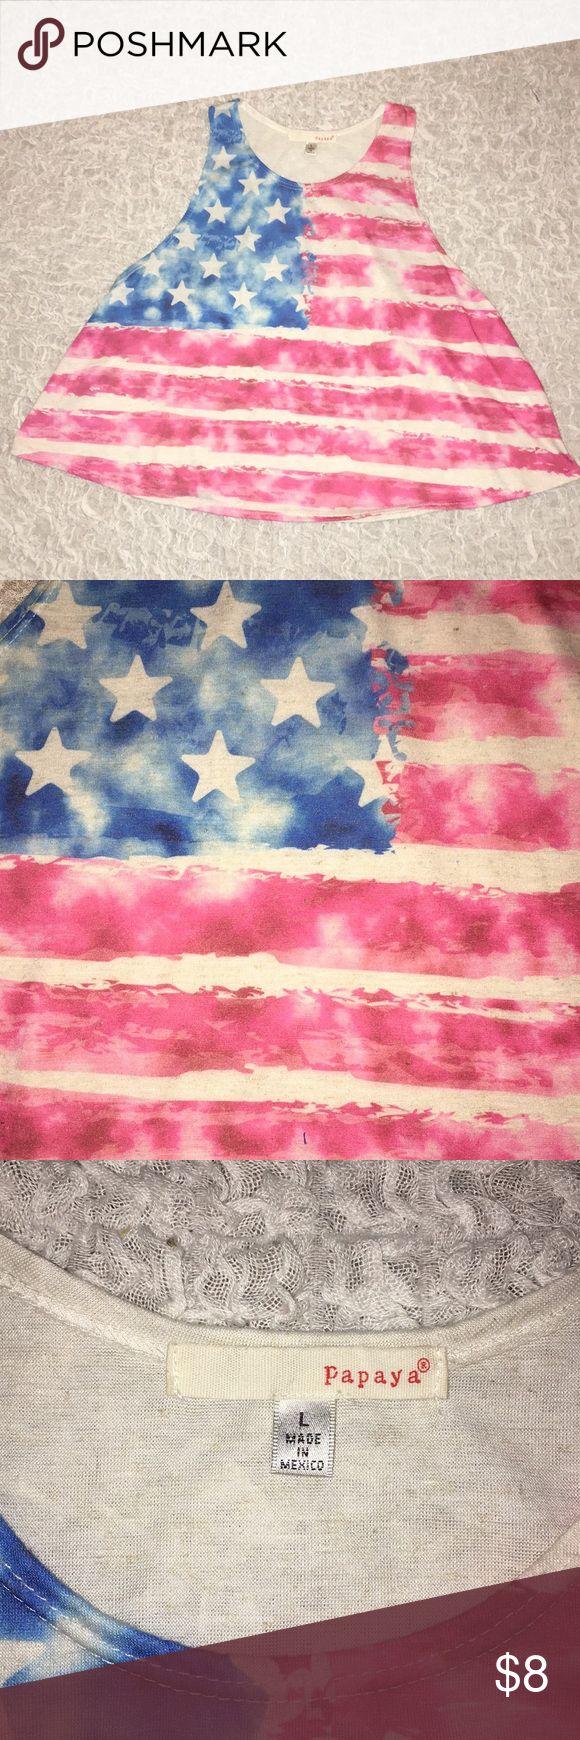 American Flag Tank Top - Papaya American Flag Tank Top - Papaya Crop Top  Large Papaya Tops Crop Tops